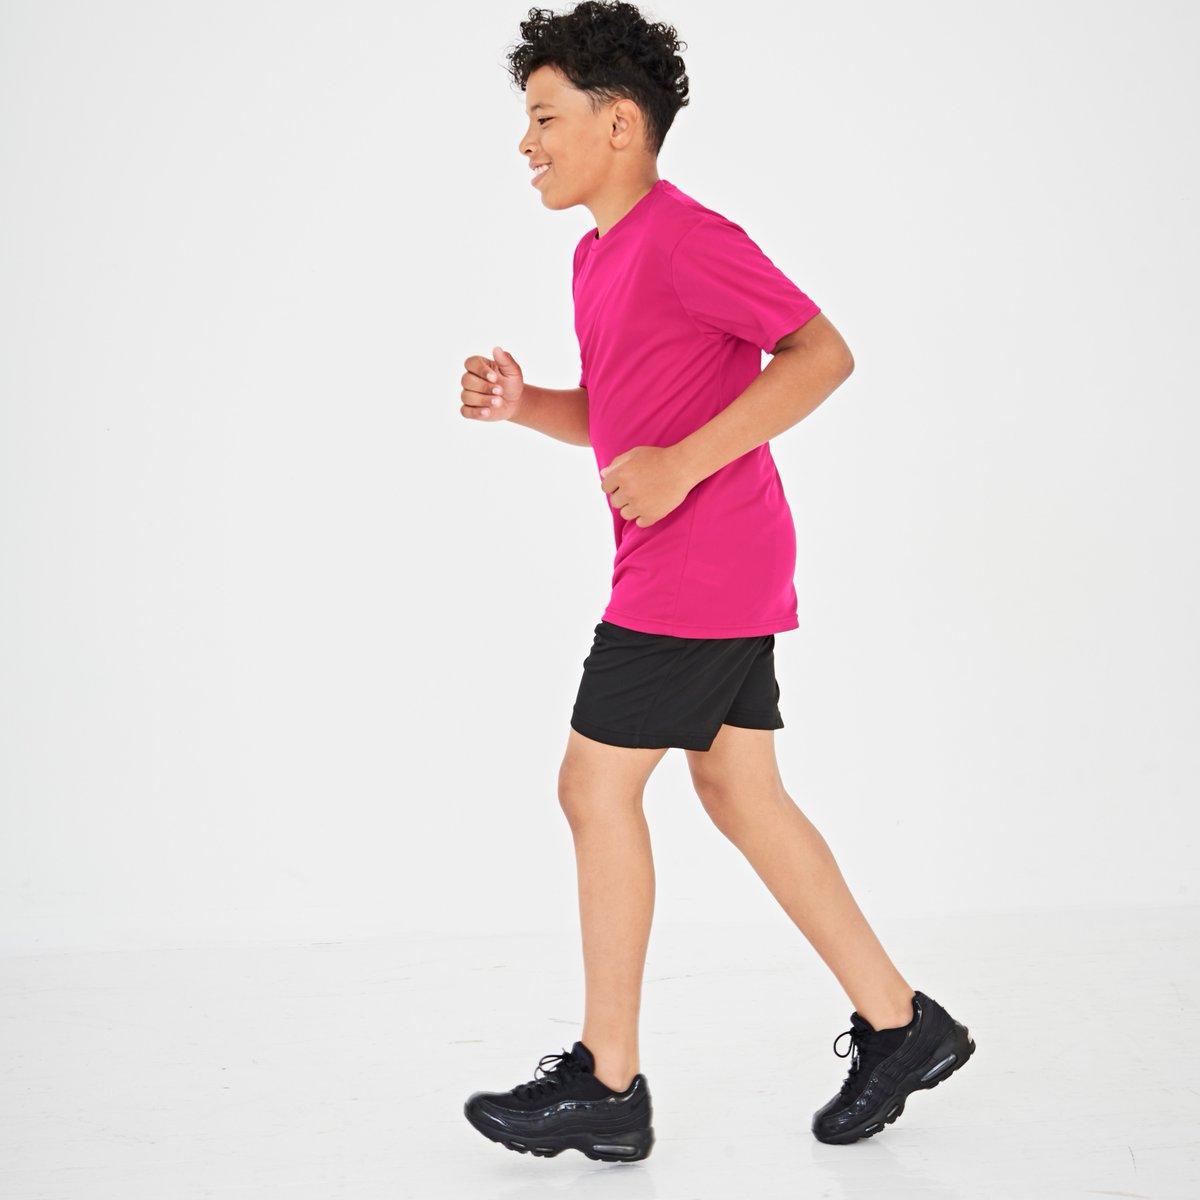 Running away ... 🏃🏽♀️🏃🏻♂️ Check out our JC020J Kids Cool Smooth T   @justcoolbyawdis.com  #JustCool #AWDis #JustCoolbyAWDis #AWDisbrands #run #marathon #funrun #virtualrun #activewear #sportswear #performance #customisation #printing #branding #customised #colour #exercise #fit https://t.co/DdOJ7IZuVY